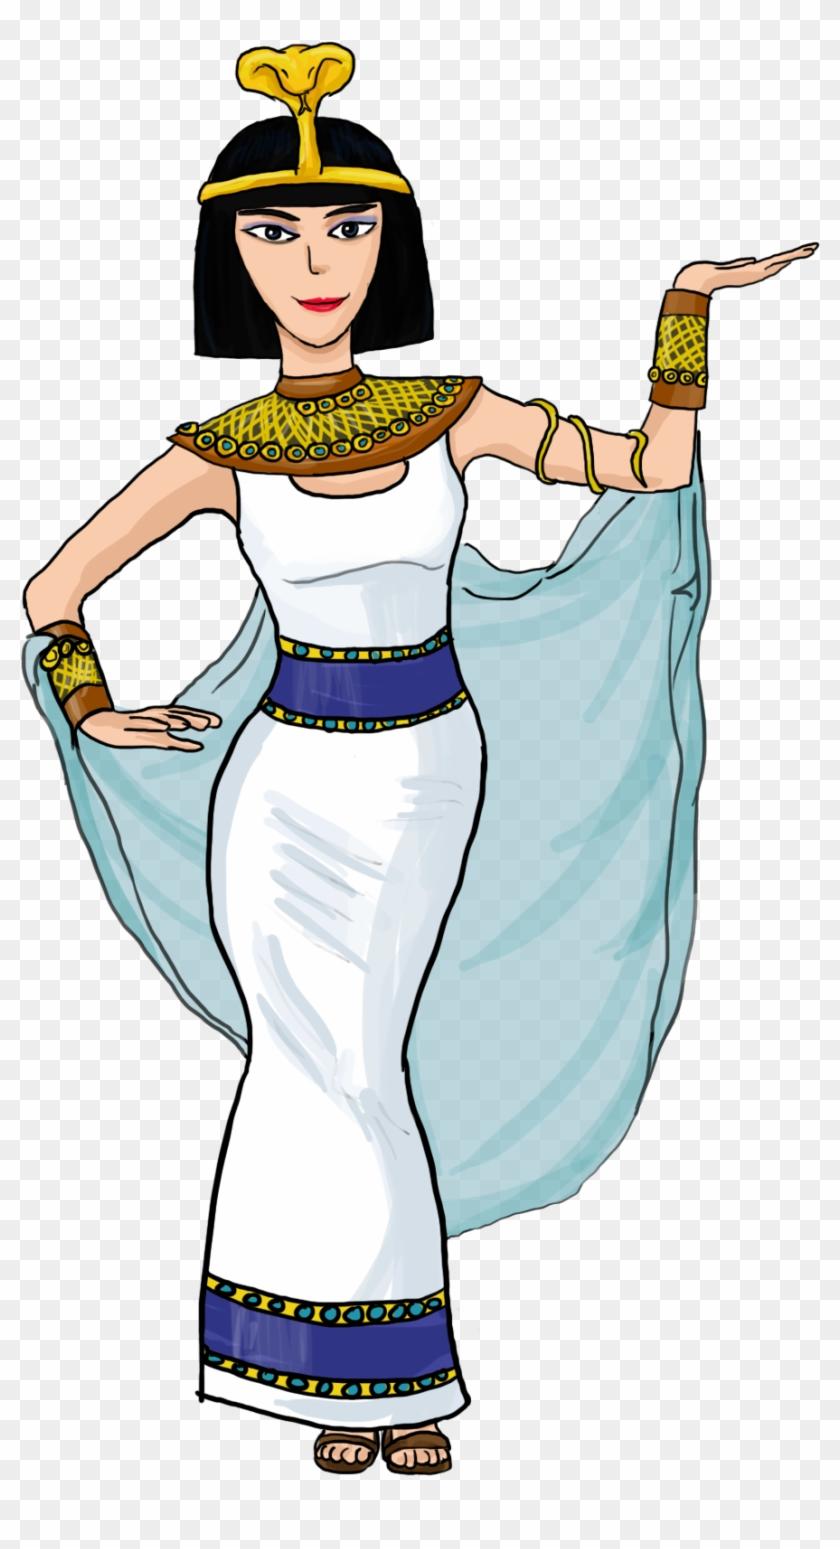 Princess Clipart Ancient Egyptian - Pharaoh Clip Art #366196